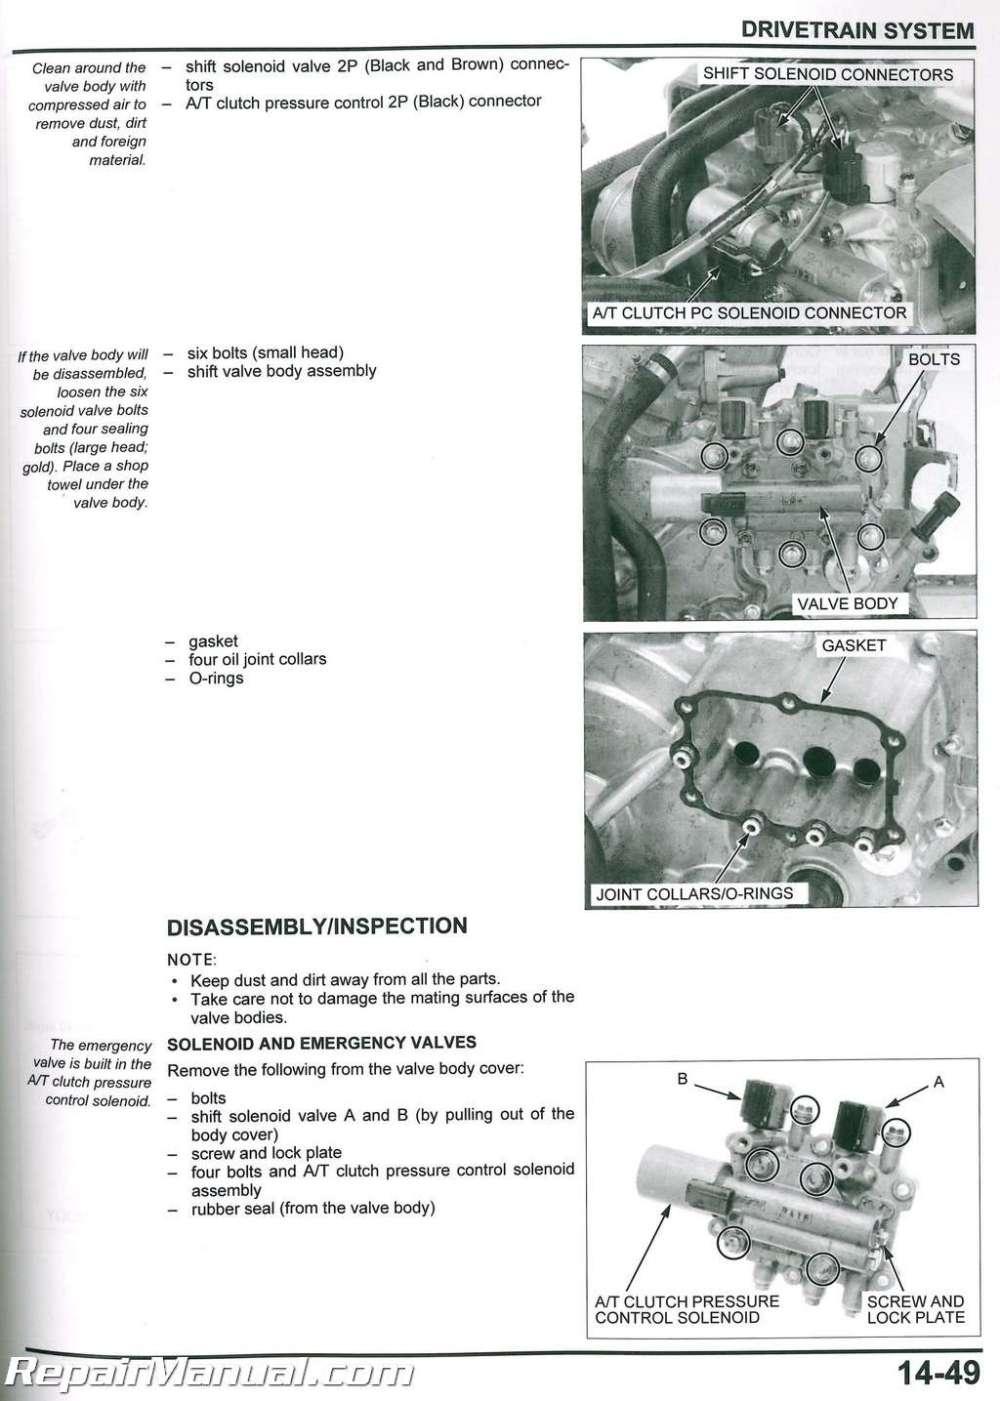 medium resolution of honda rincon 680 diagram wiring diagrams long honda rincon 680 diagram